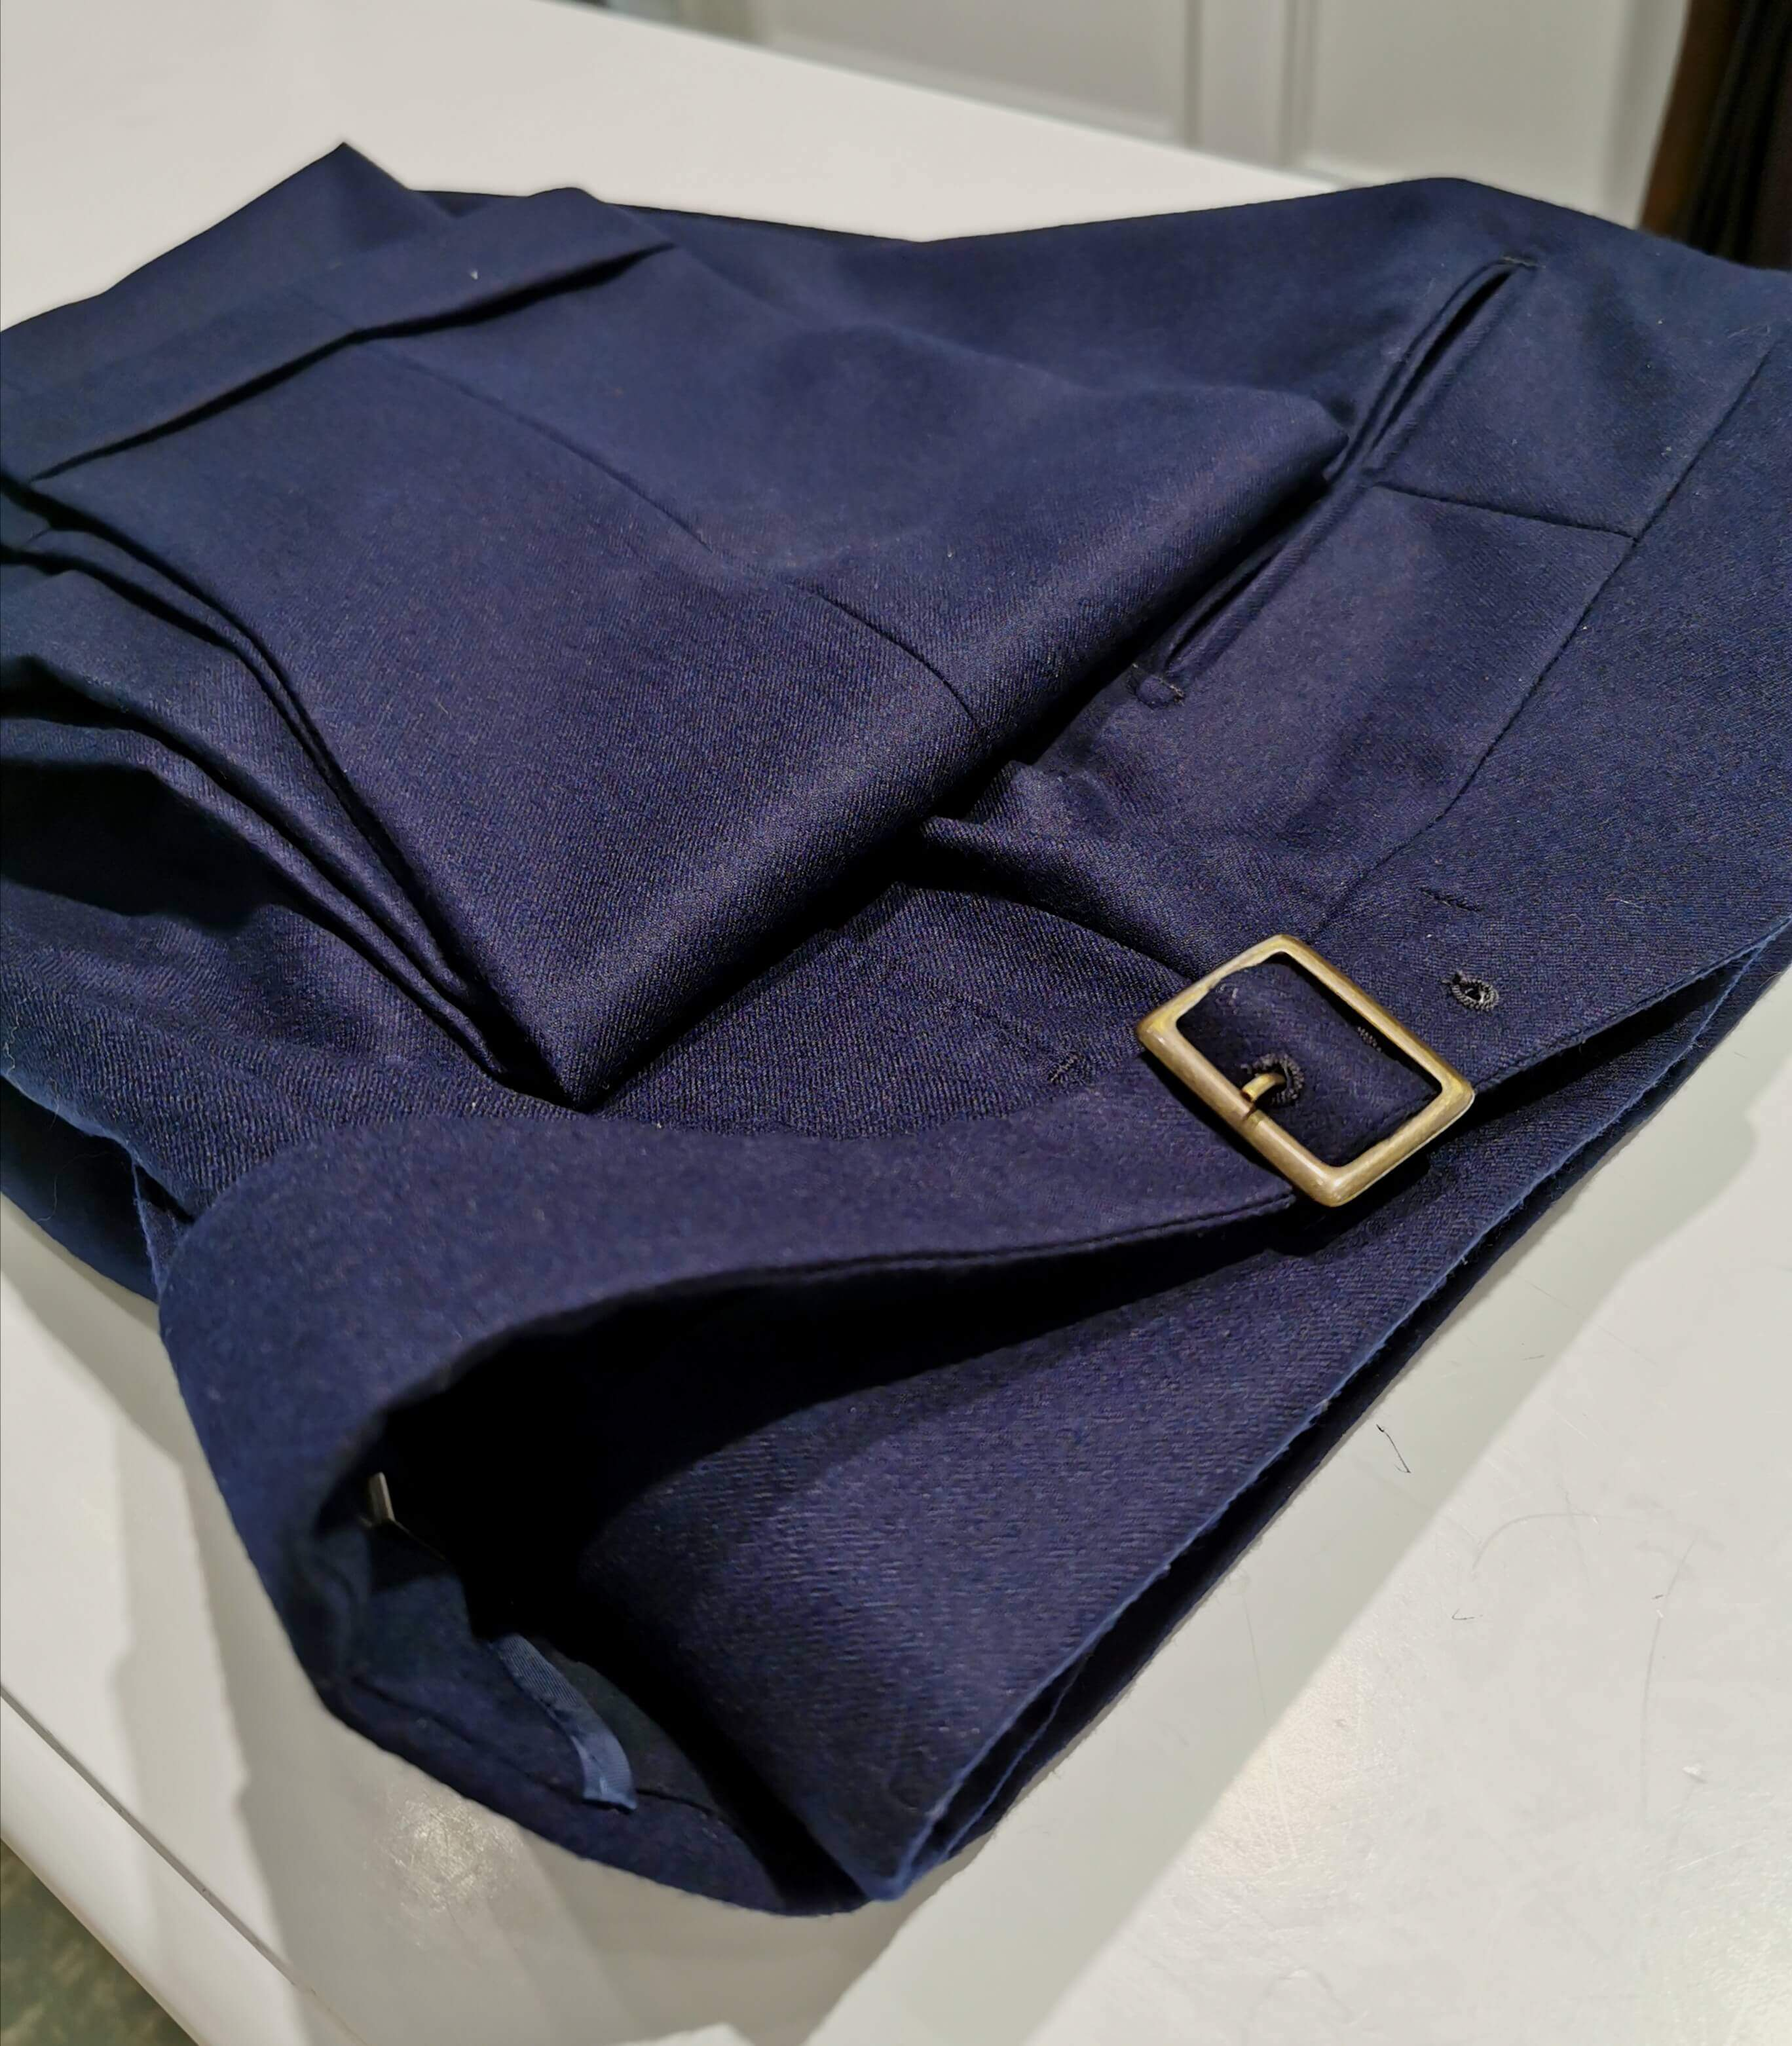 Pantalon Holland & Sherry en flanelle, t. 44